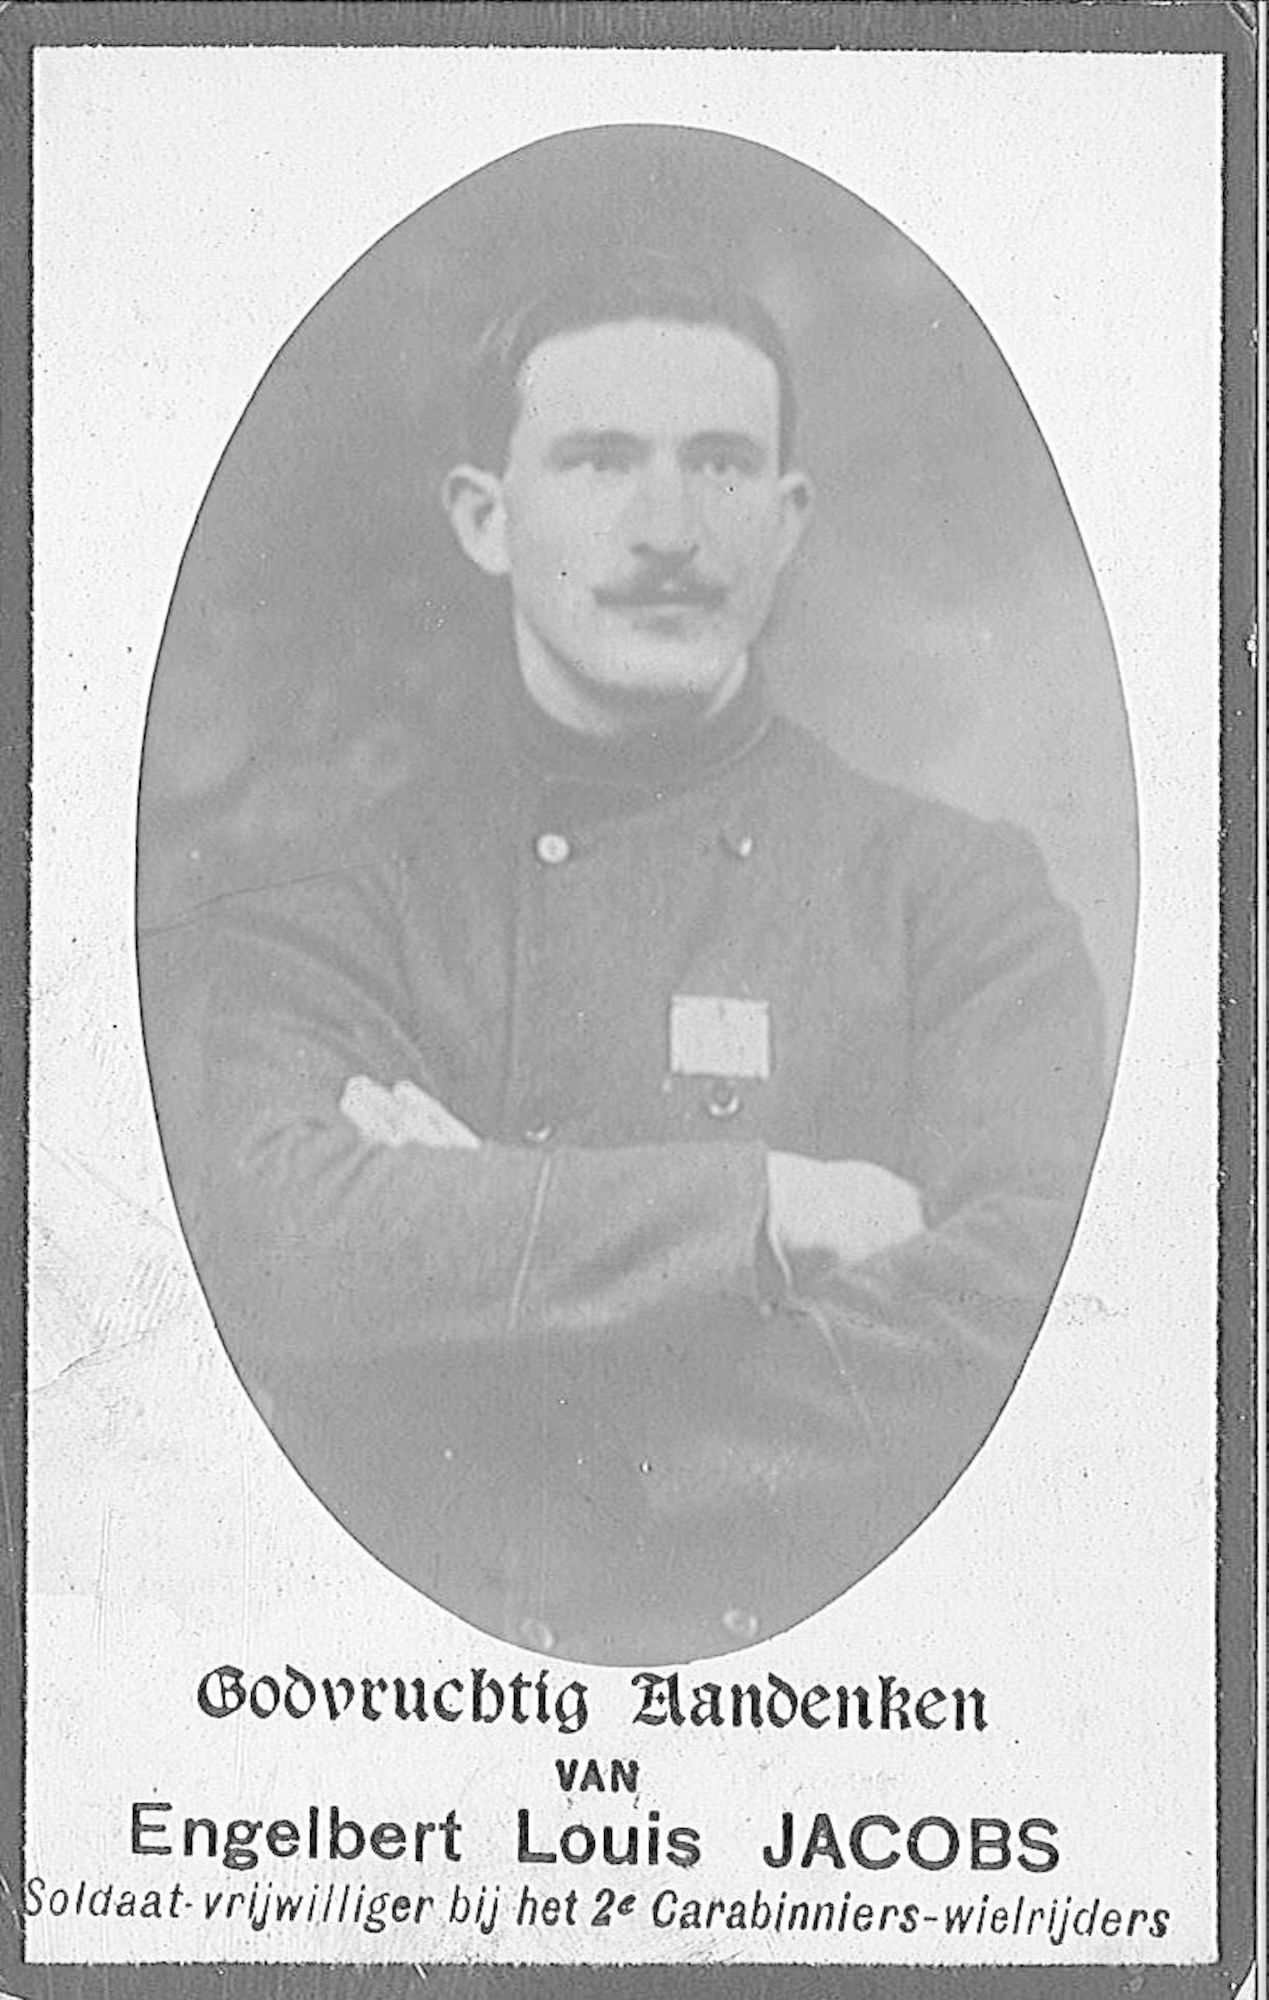 Engelbert-Louis Jacobs